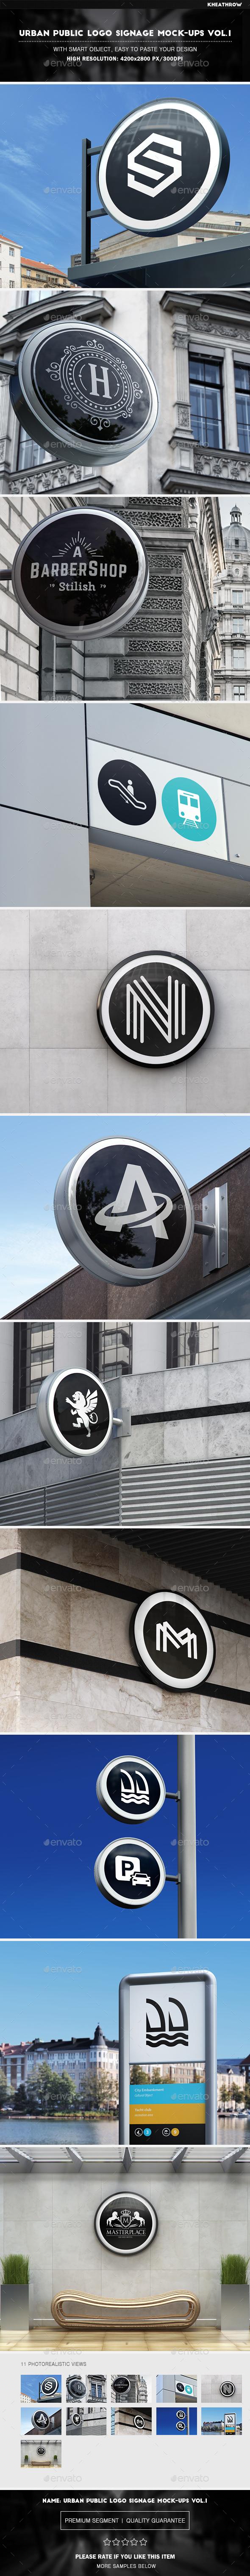 Urban Public Logo Signage Mock-Ups Vol.1 - Logo Product Mock-Ups